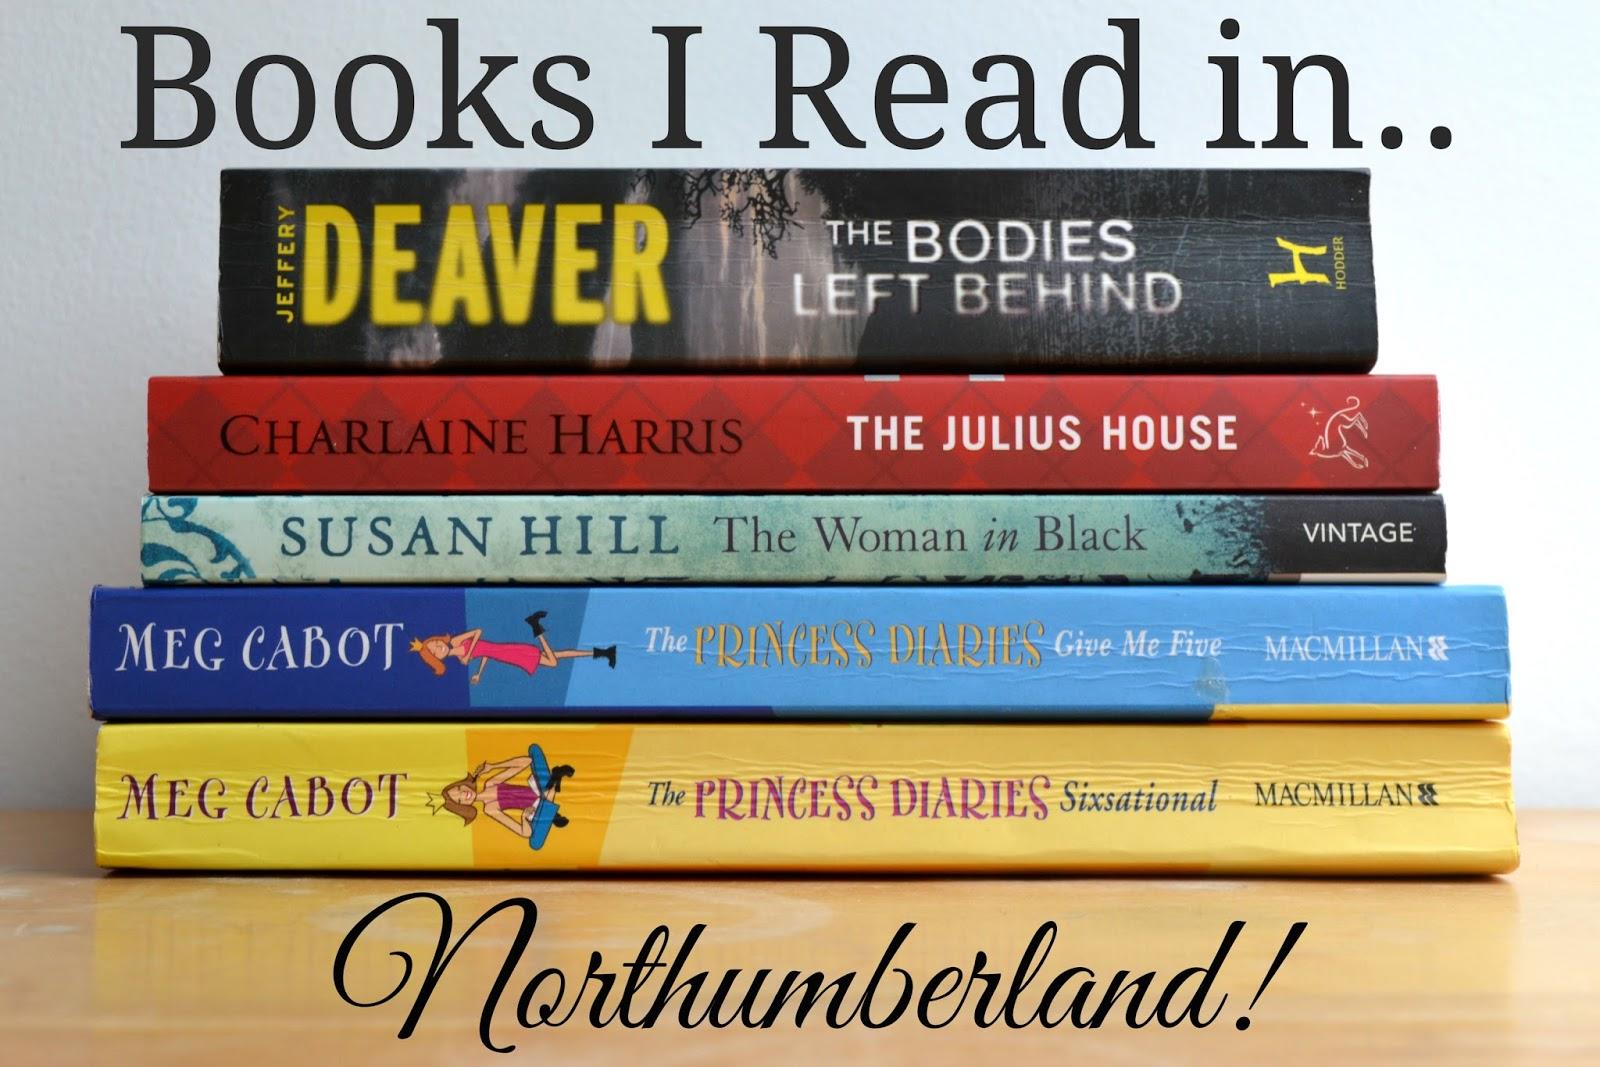 Book pile Jeffery Deaver Charlaine Harris Susan Hill Meg Cabot